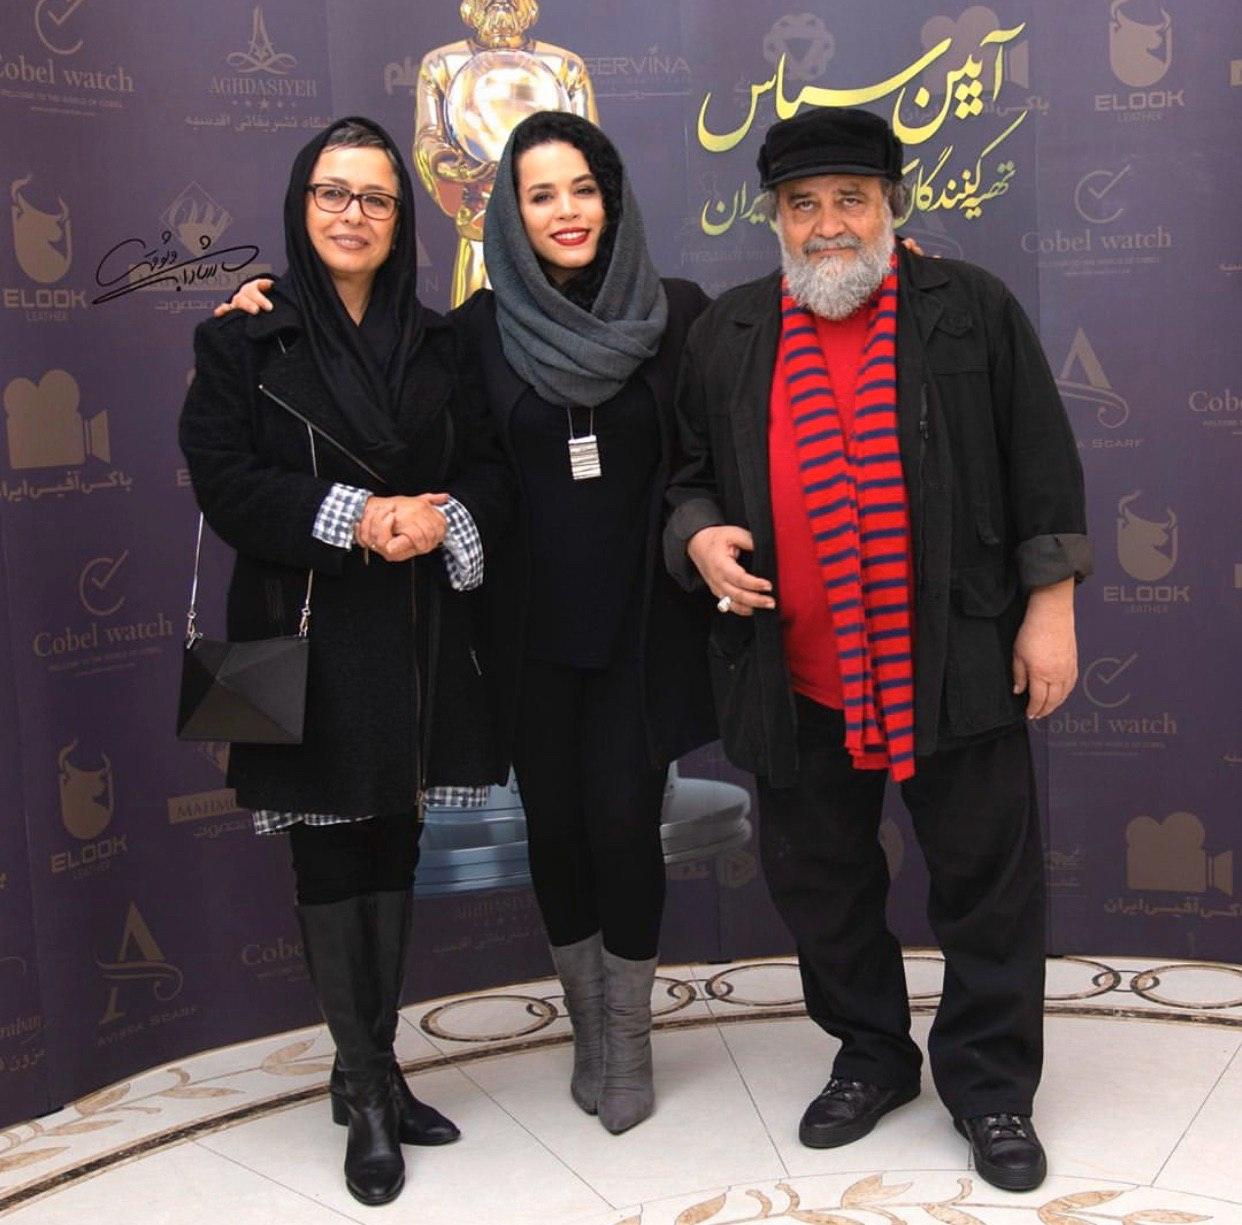 ملیکا شریفی نیا در کنار پدر و مادرش + عکس